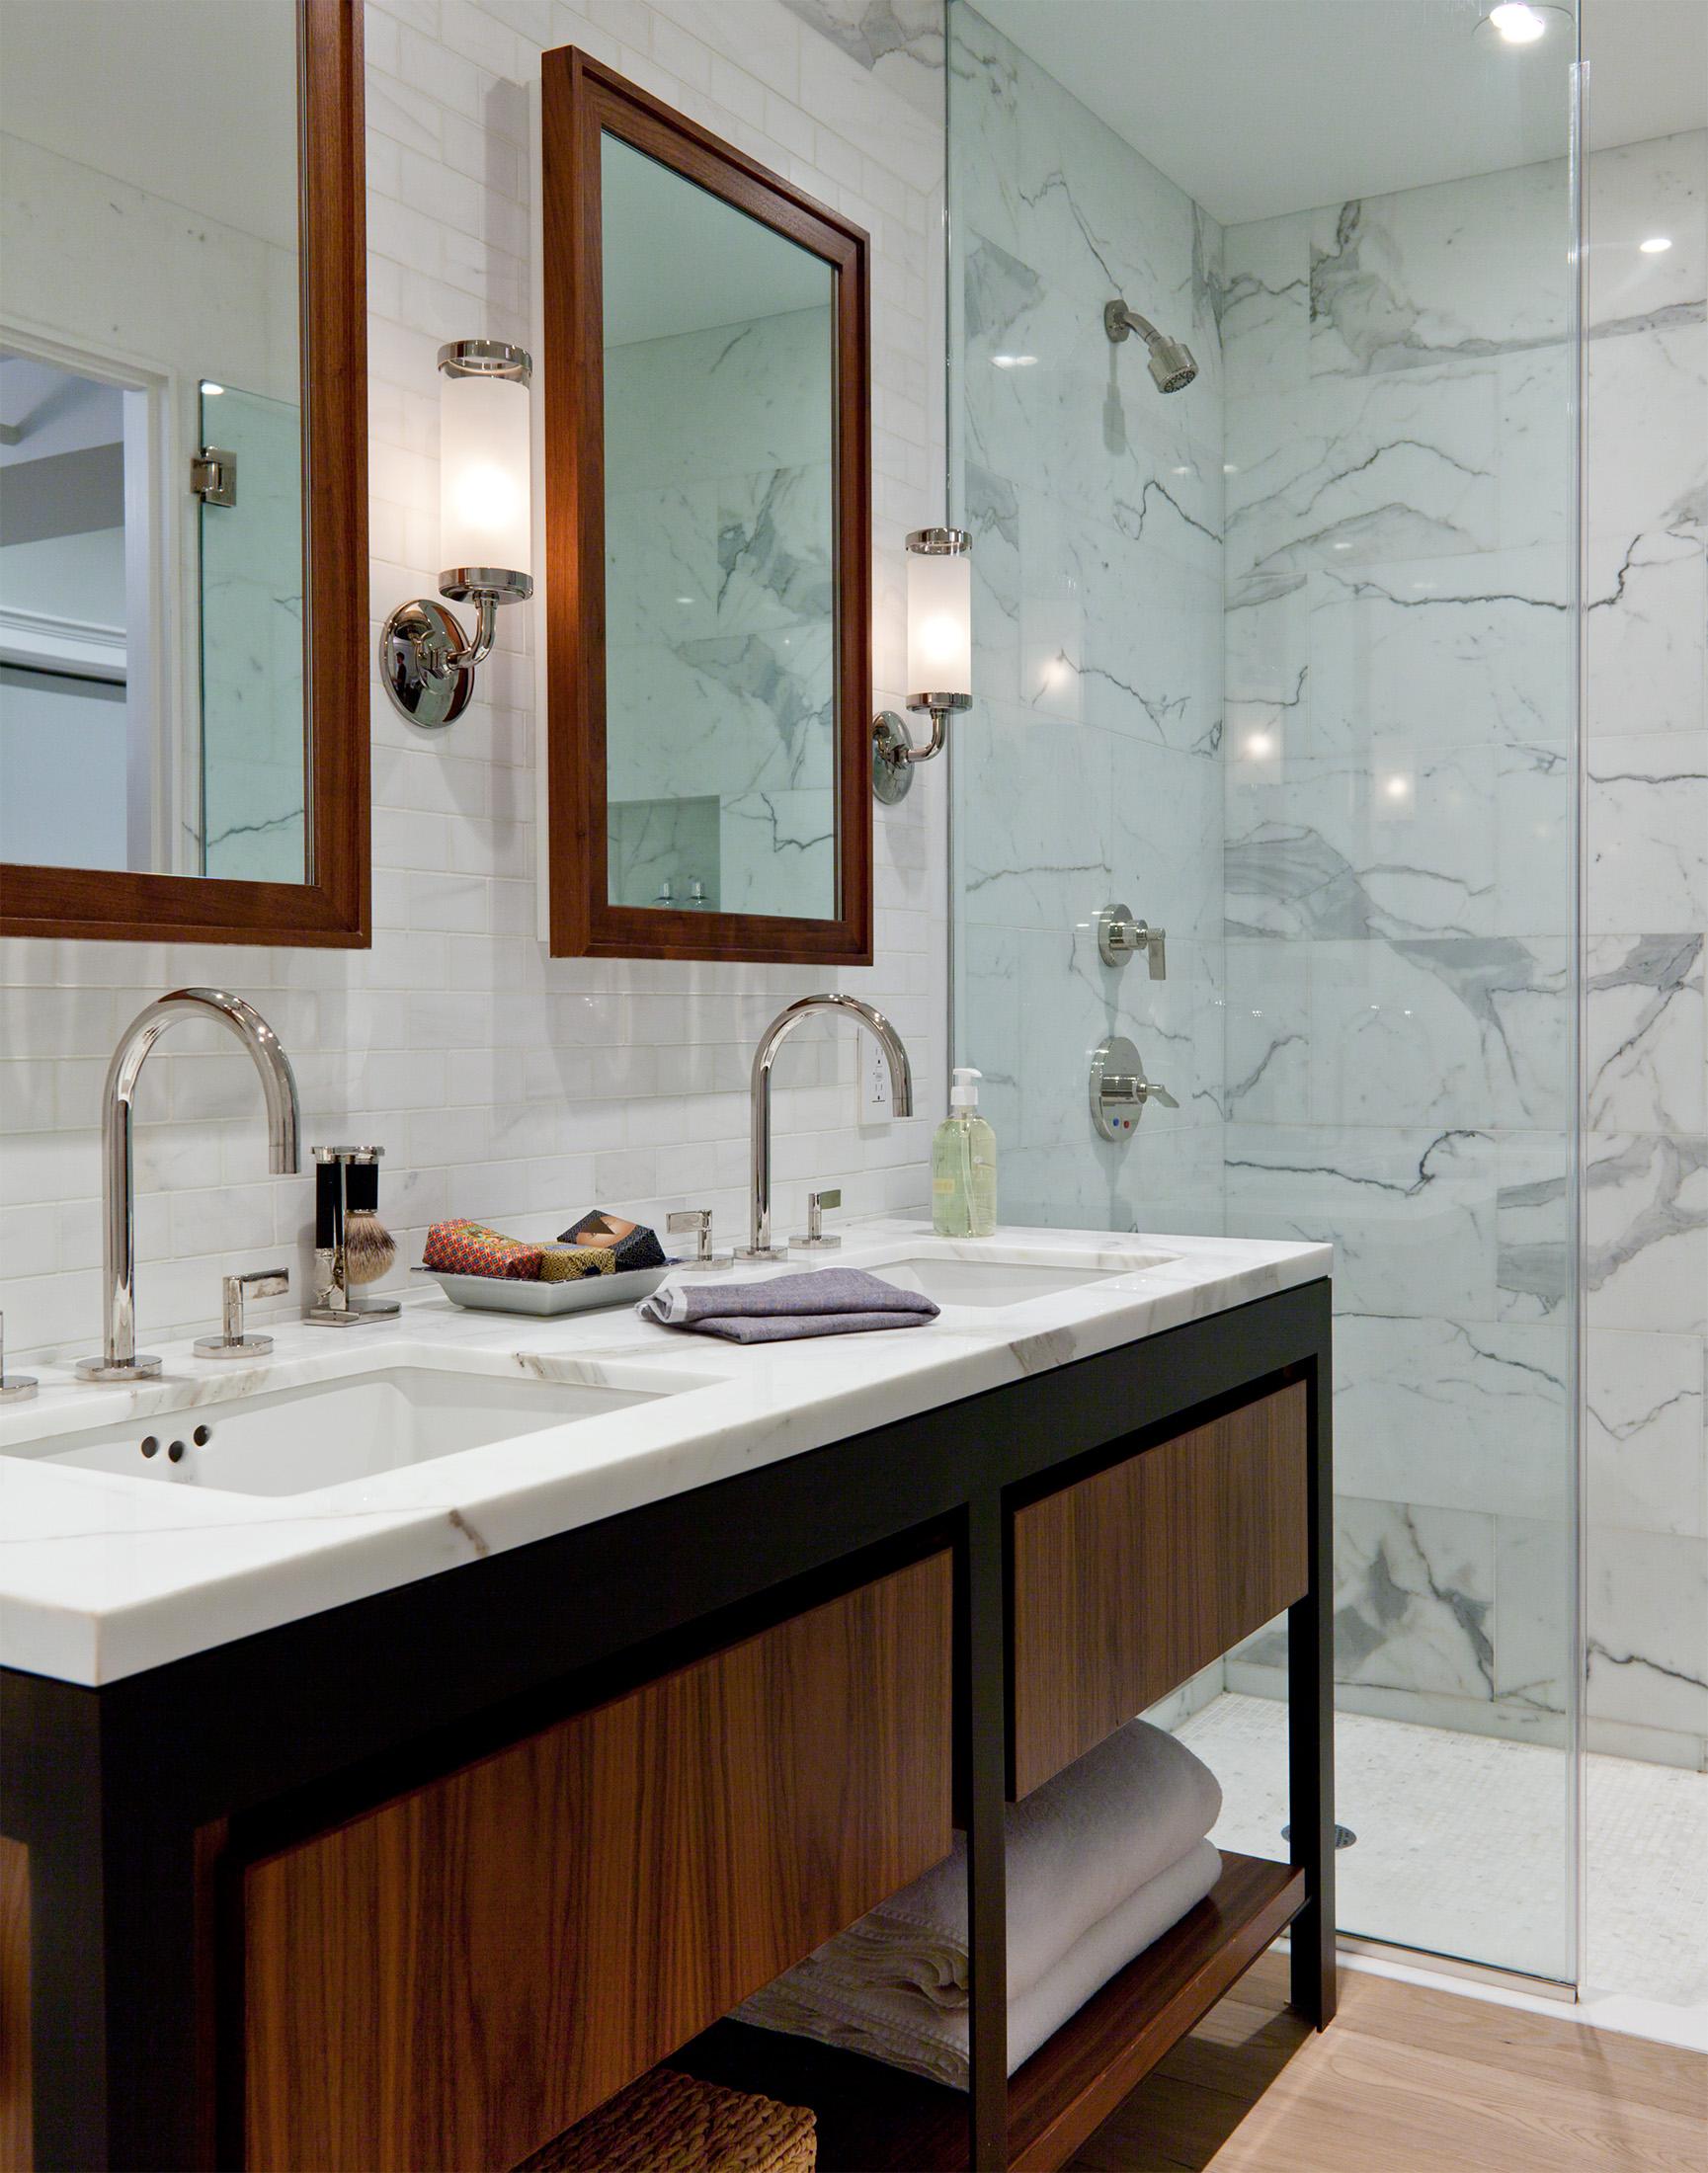 11-Master Bathroom copy.jpg